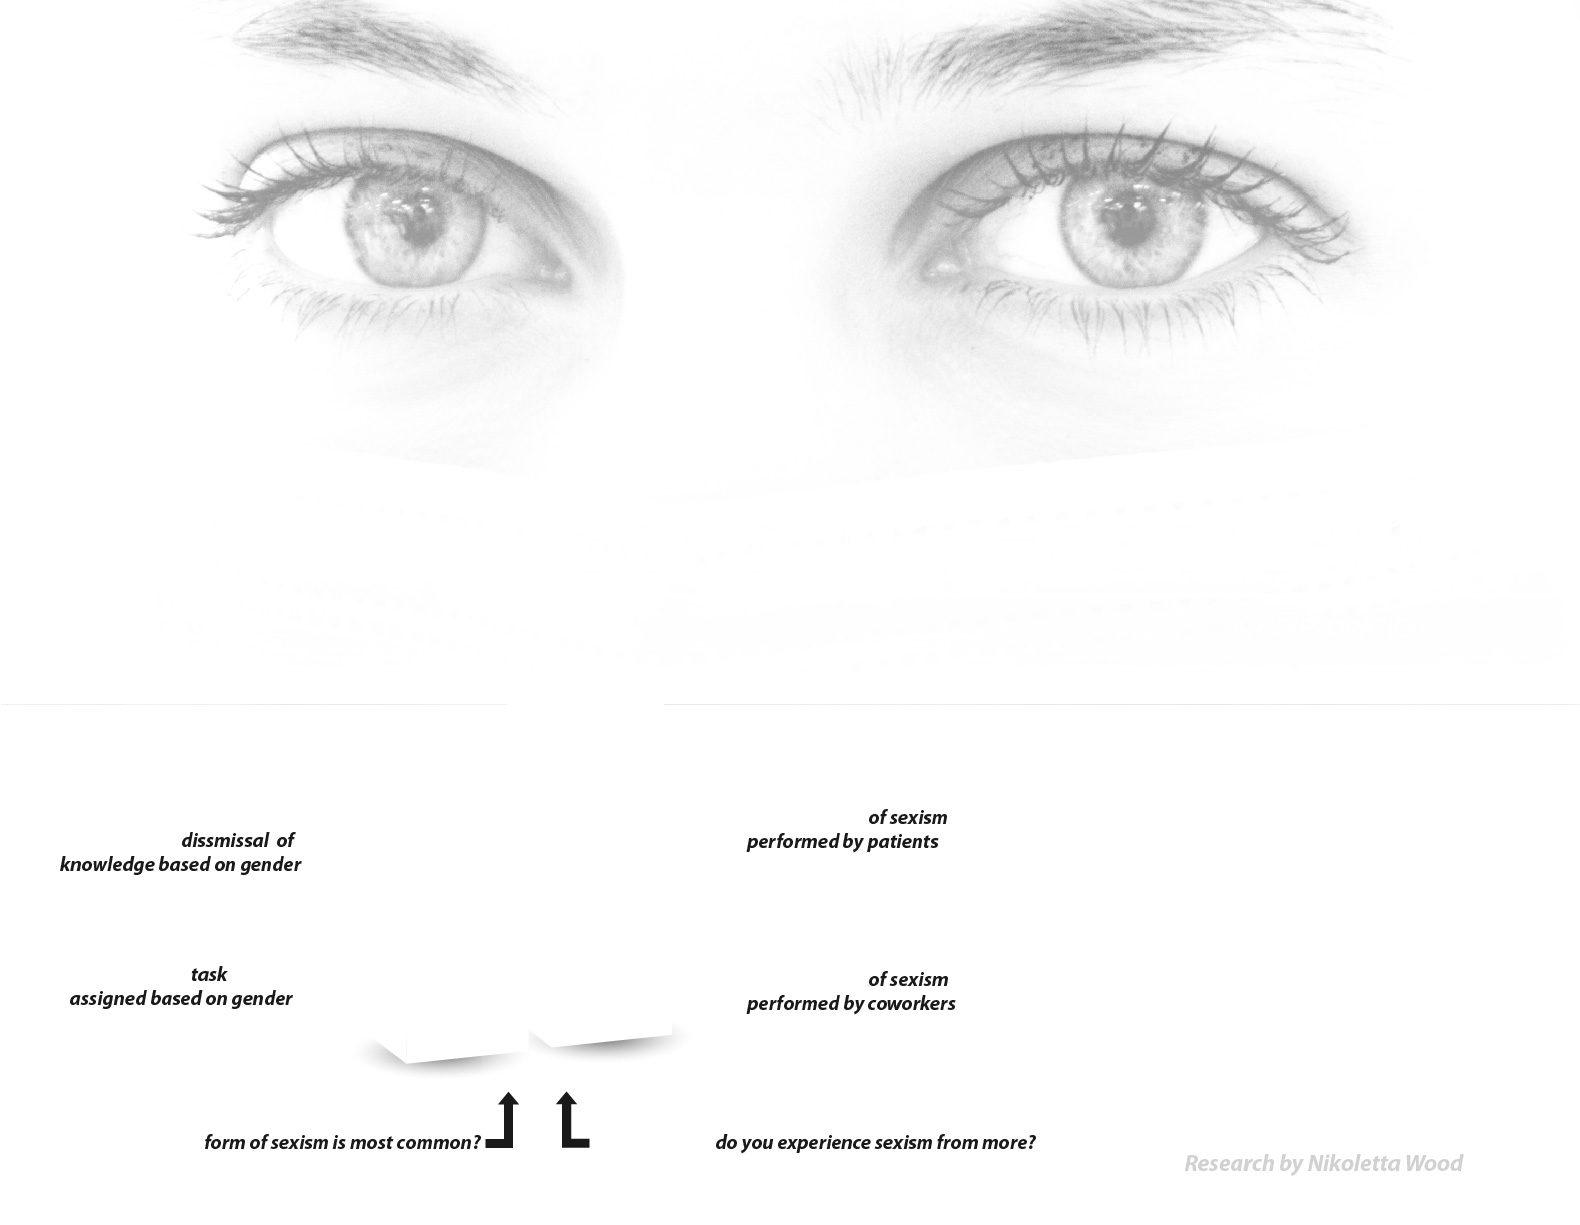 Nikoletta Wood Research Poster